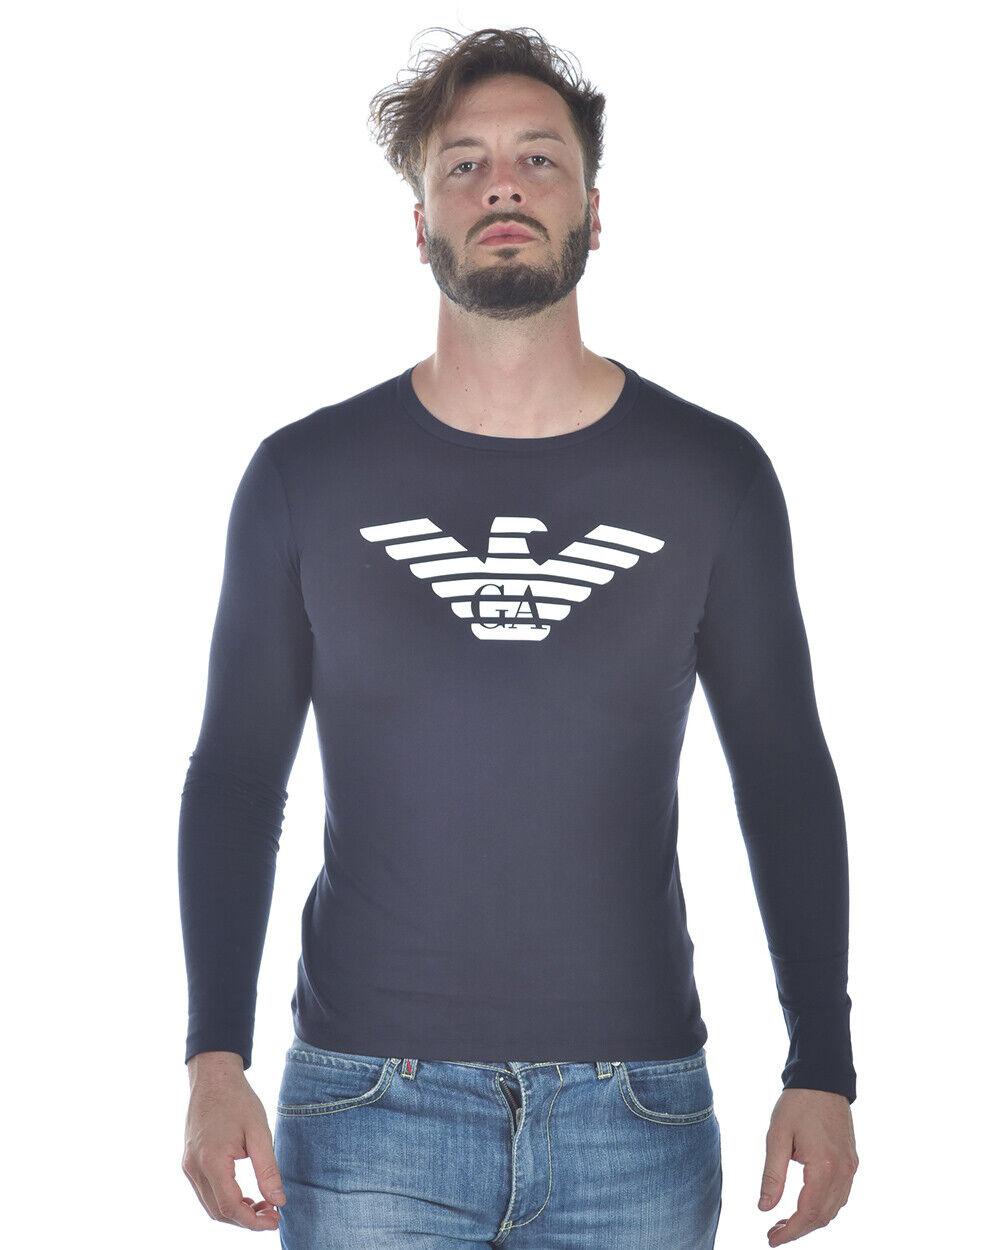 Emporio Armani T Shirt Sweatshirt Man Blau 8N1T641JPZZ 939 Sz.XL MAKE OFFER